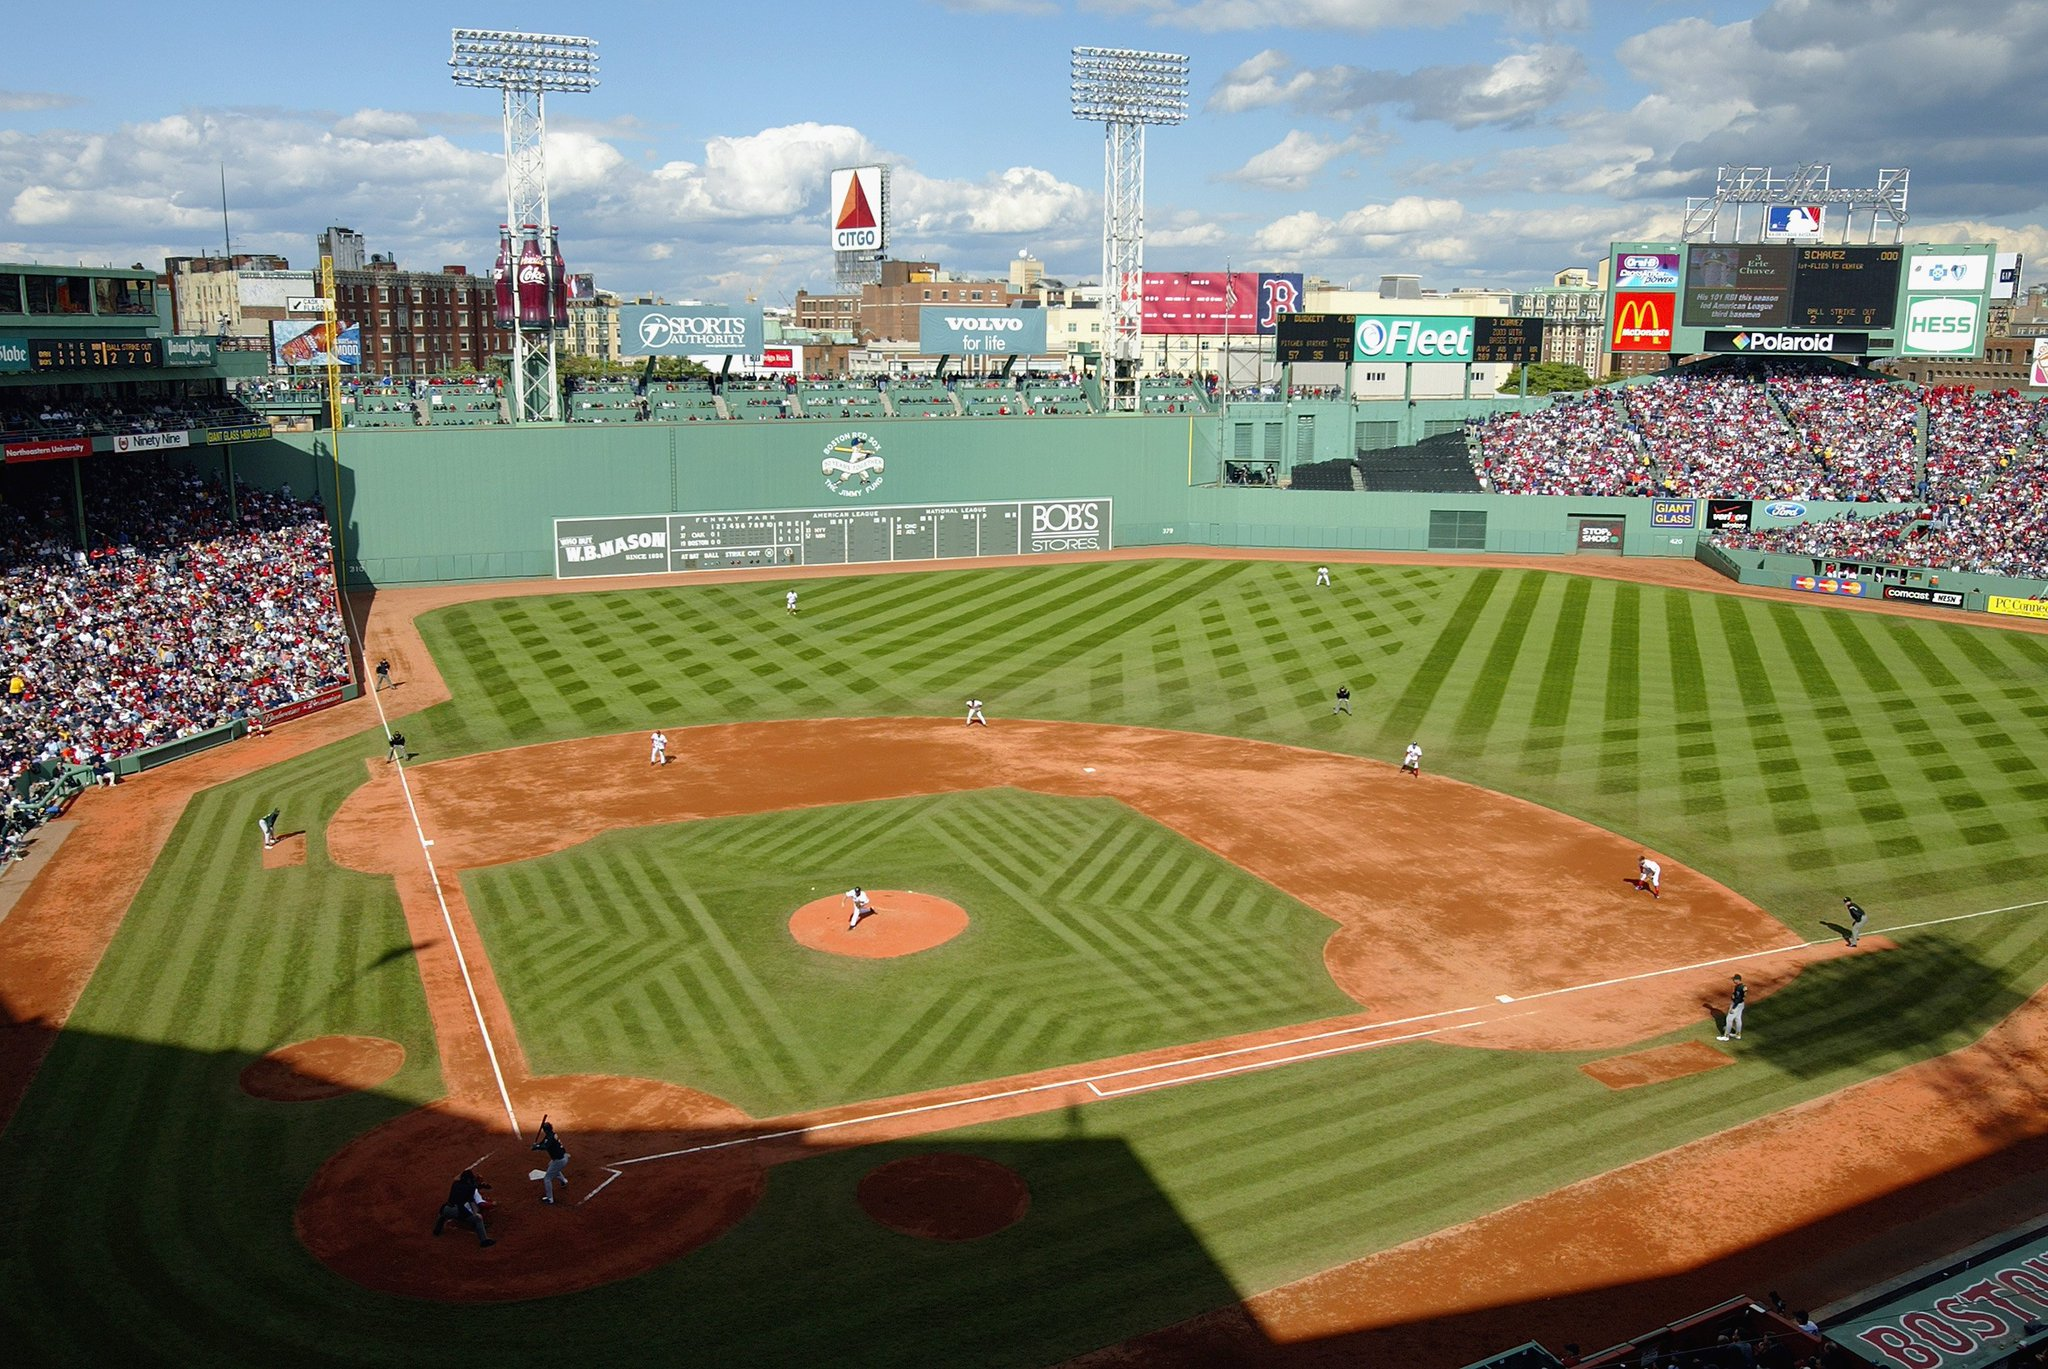 #OneThingIAlwaysSay We can't wait for baseball to be back. https://t.co/12boaEDKZc